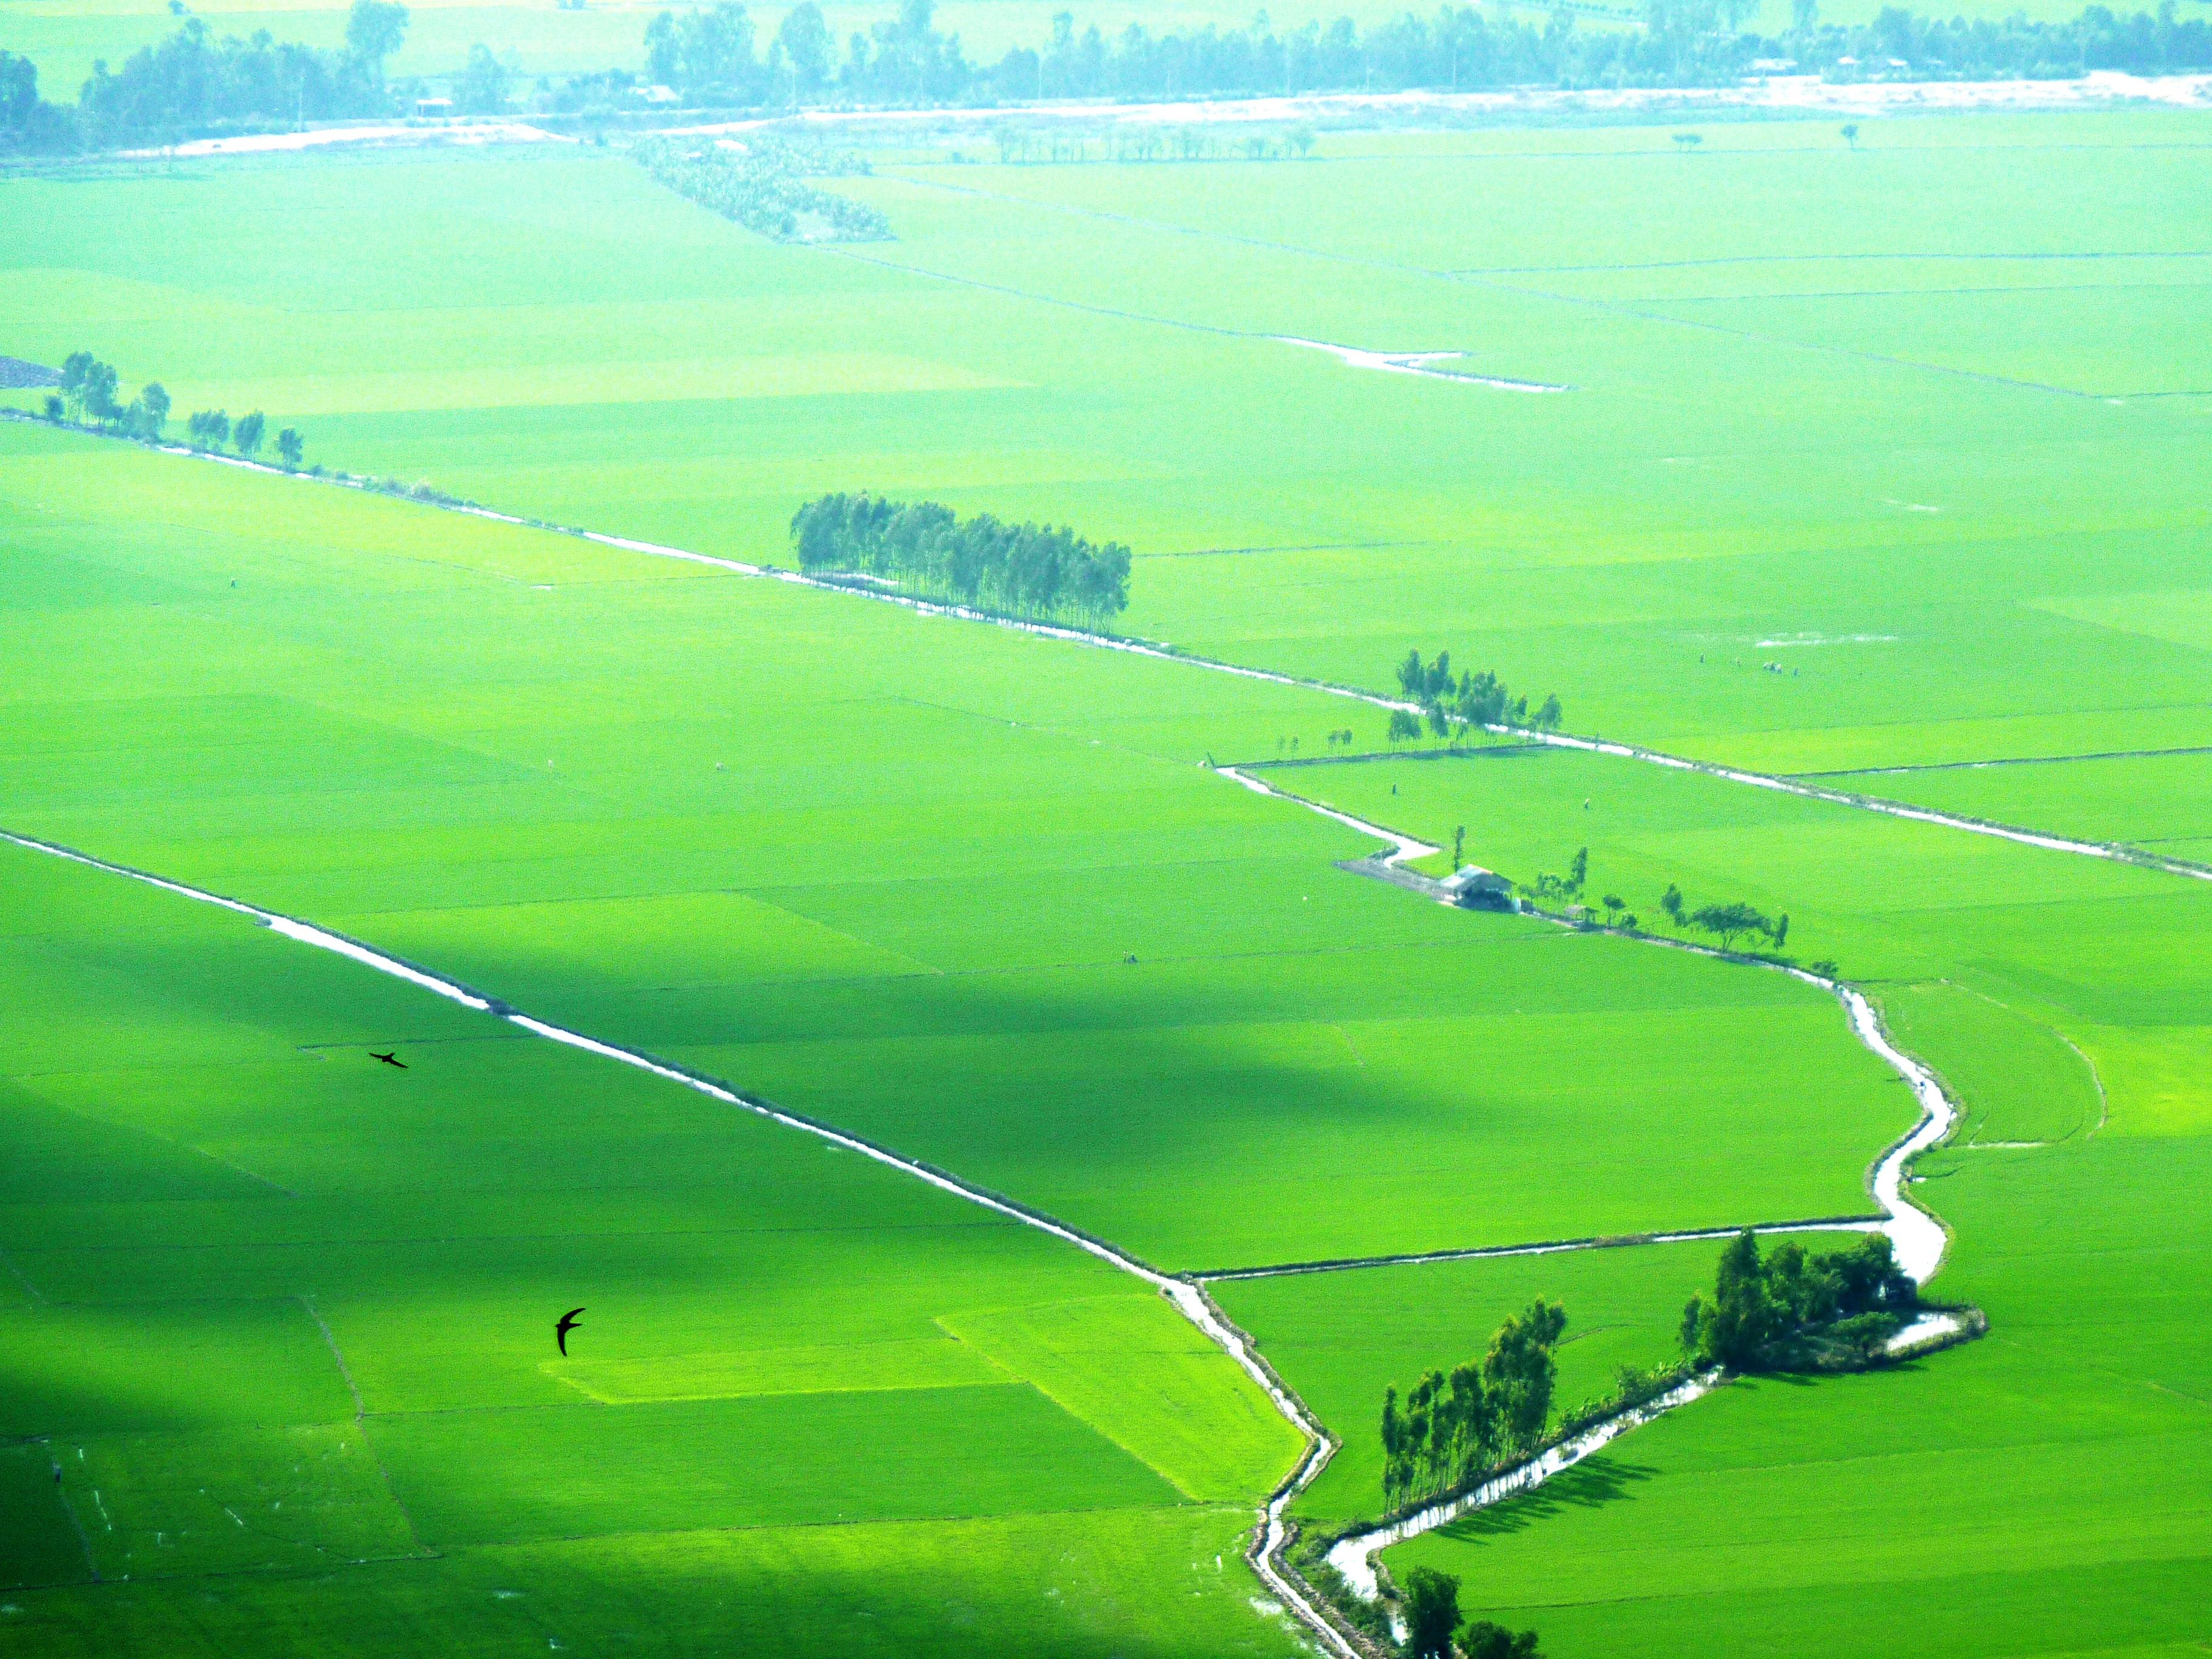 Gambar Pemandangan Alam Horison Struktur Bidang Padang Rumput